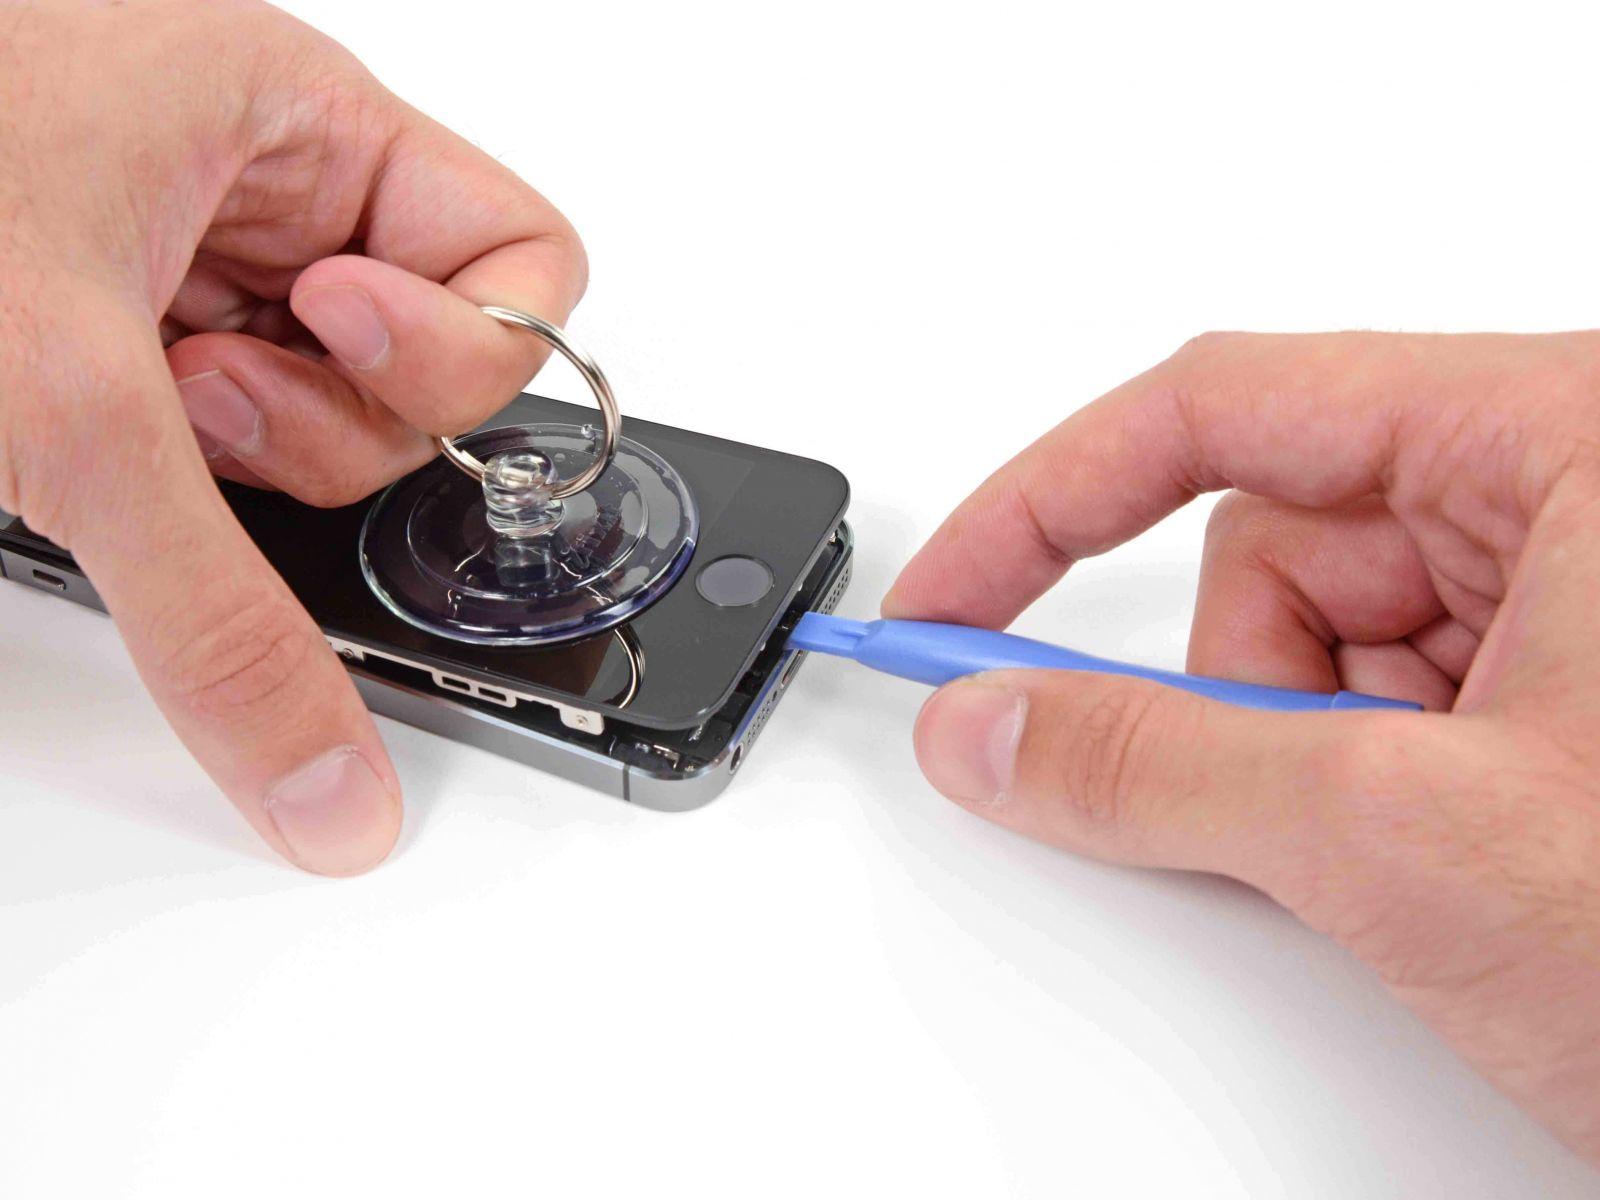 Замена сенсорного стекла и дисплея на iPhone 5S (7)